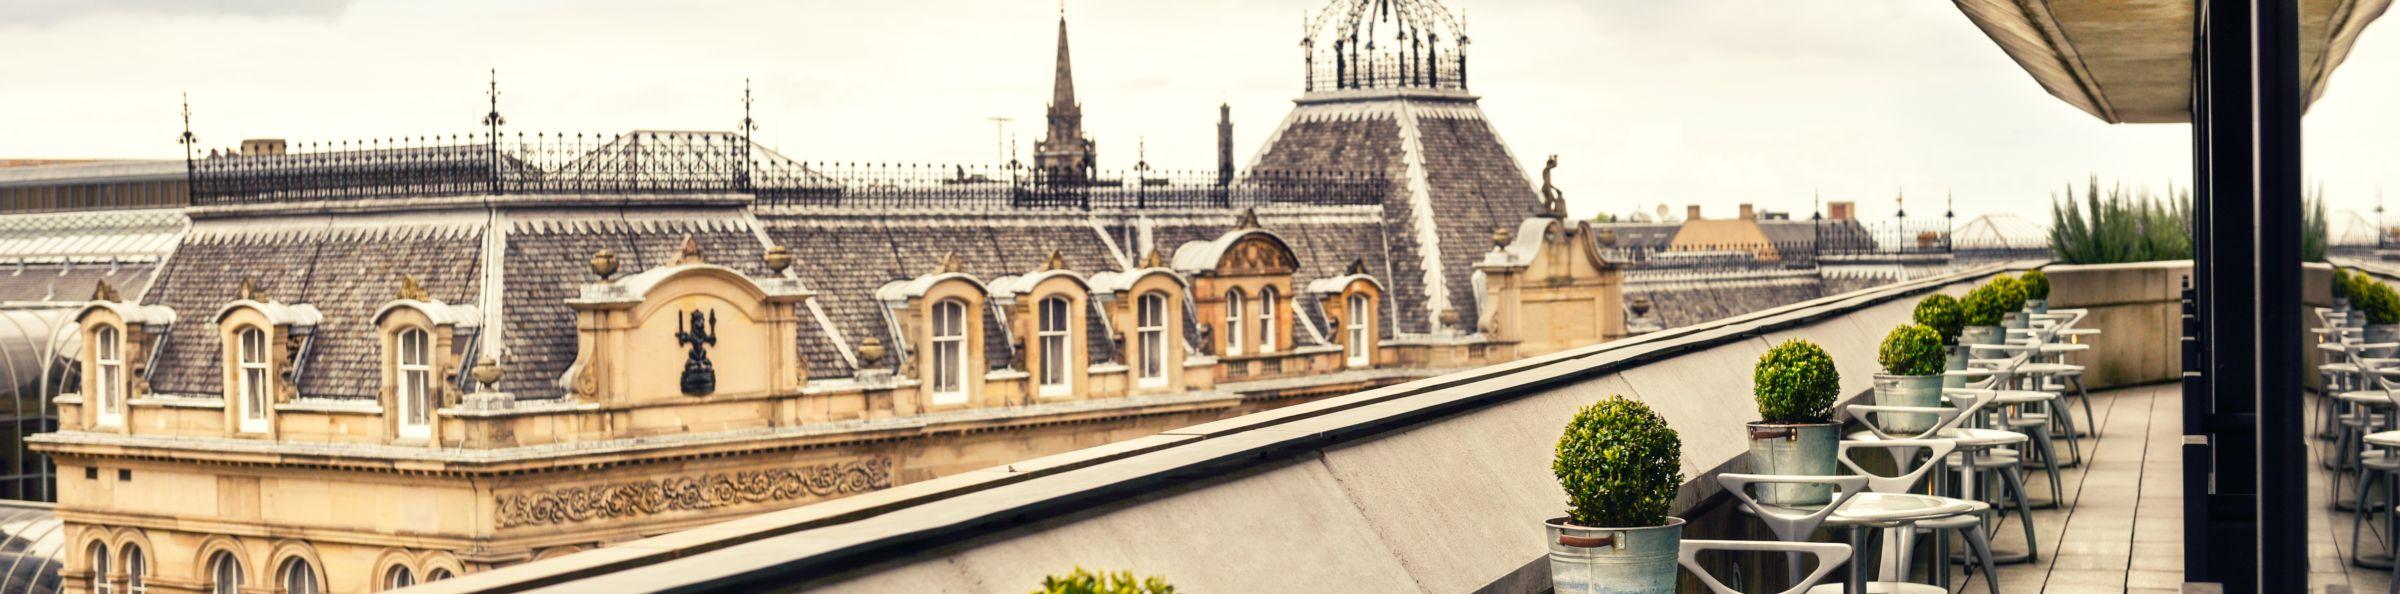 Roof top restaurant in Edinburgh